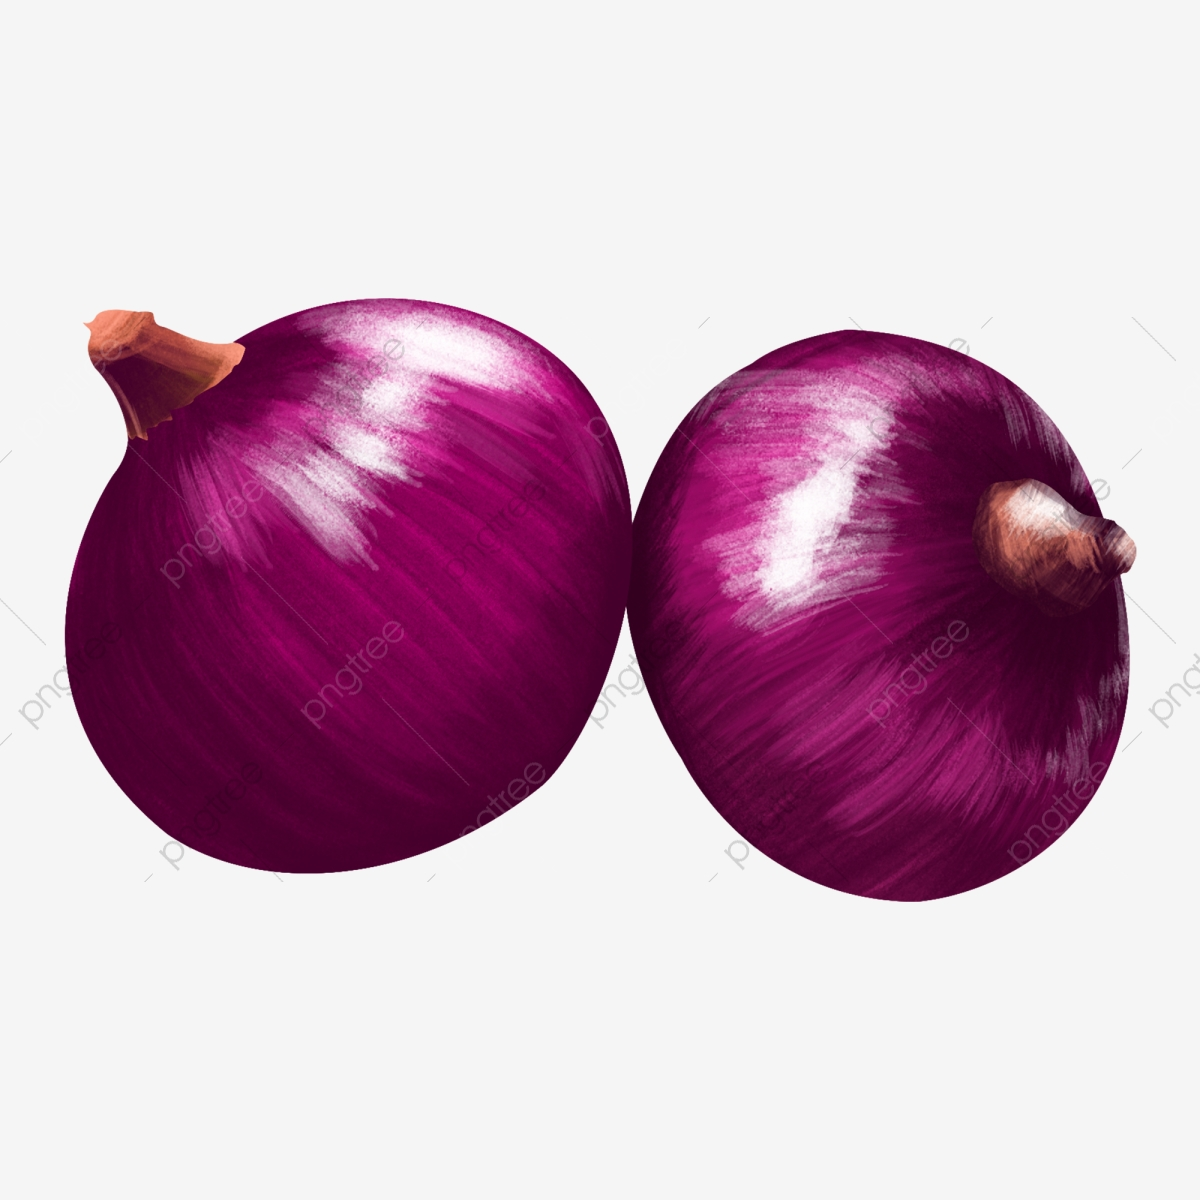 Purple Onion Vegetables Fruit, Fruit And Vegetable, Health ...